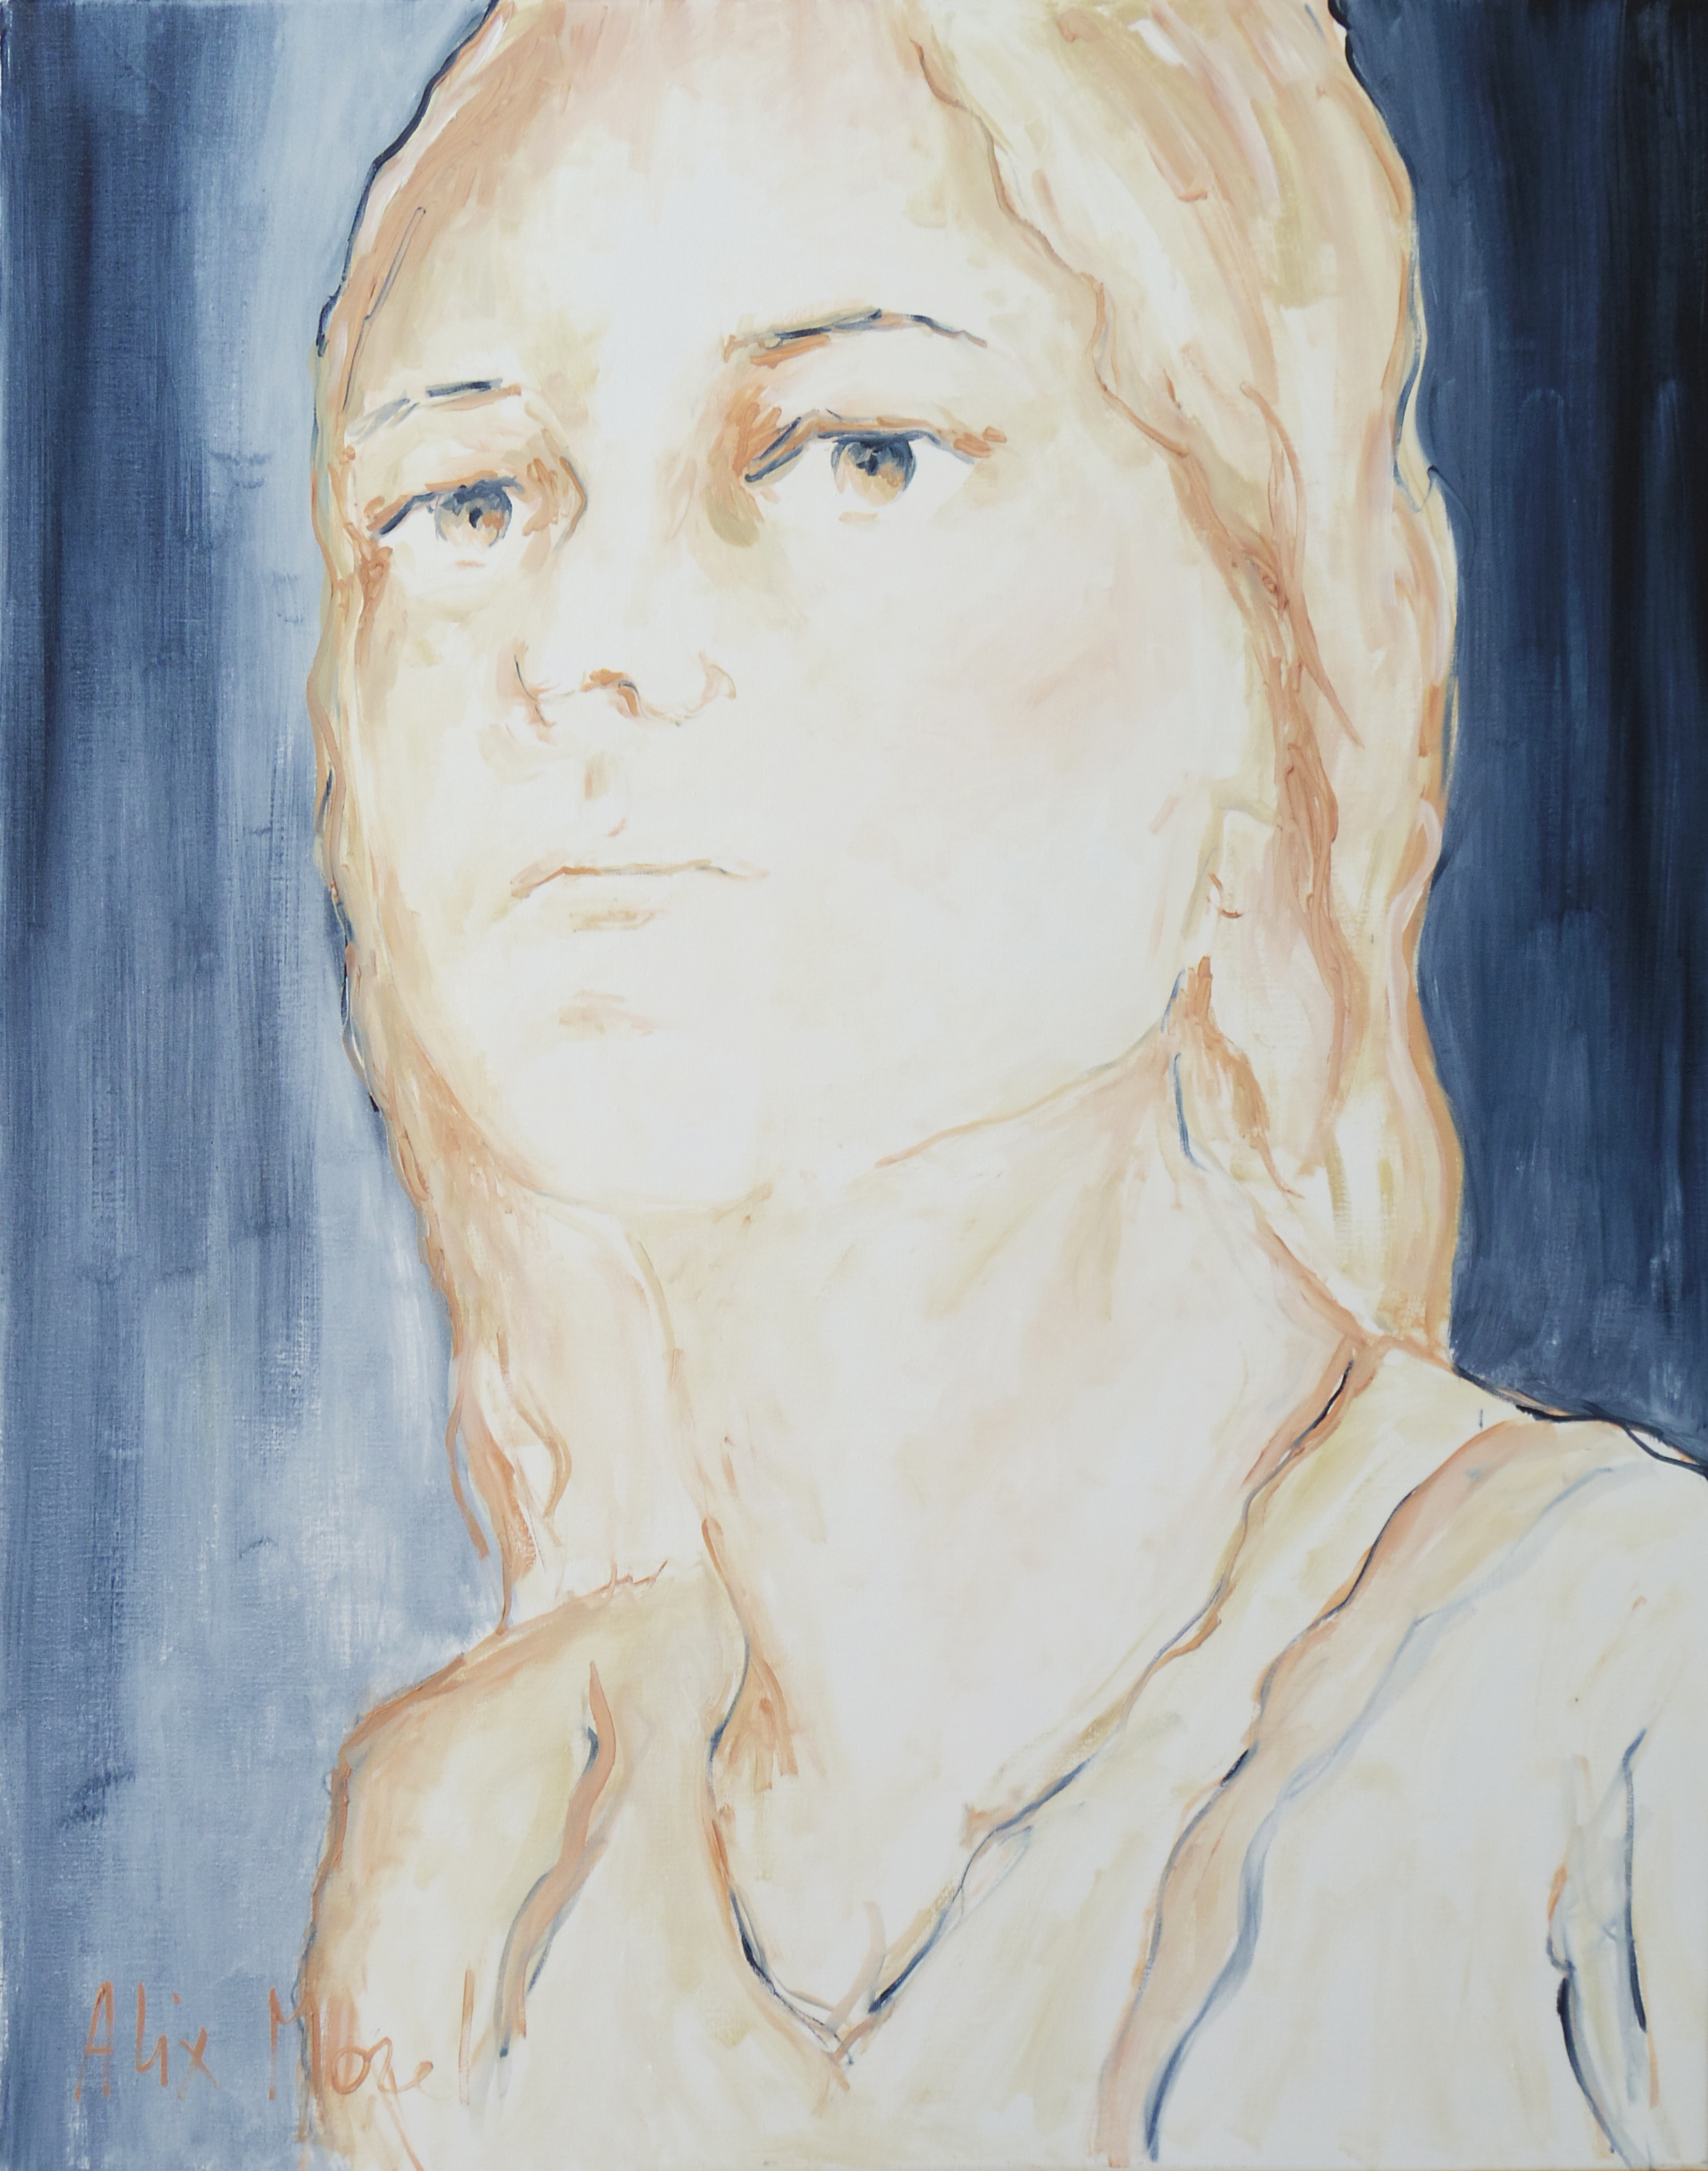 Making sense #15, oil on canvas, 92 x 73 cm, 2020